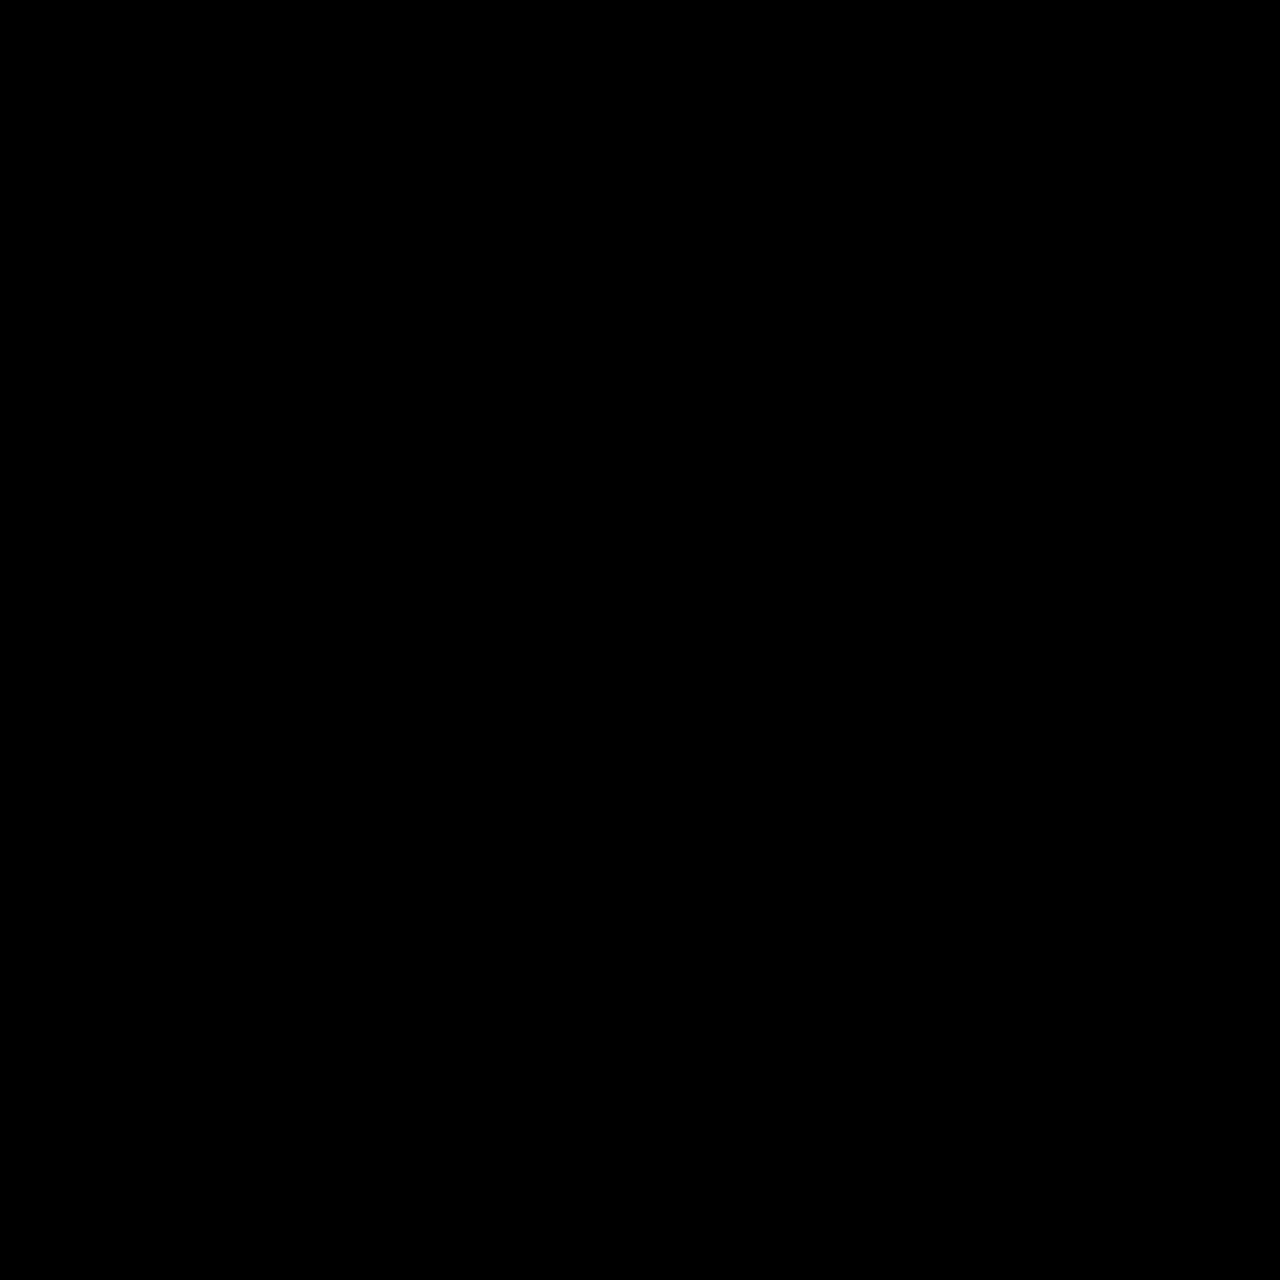 SET 81 Dřez SCHOCK TYPOS D-100 + baterie COSMO barevná 525001